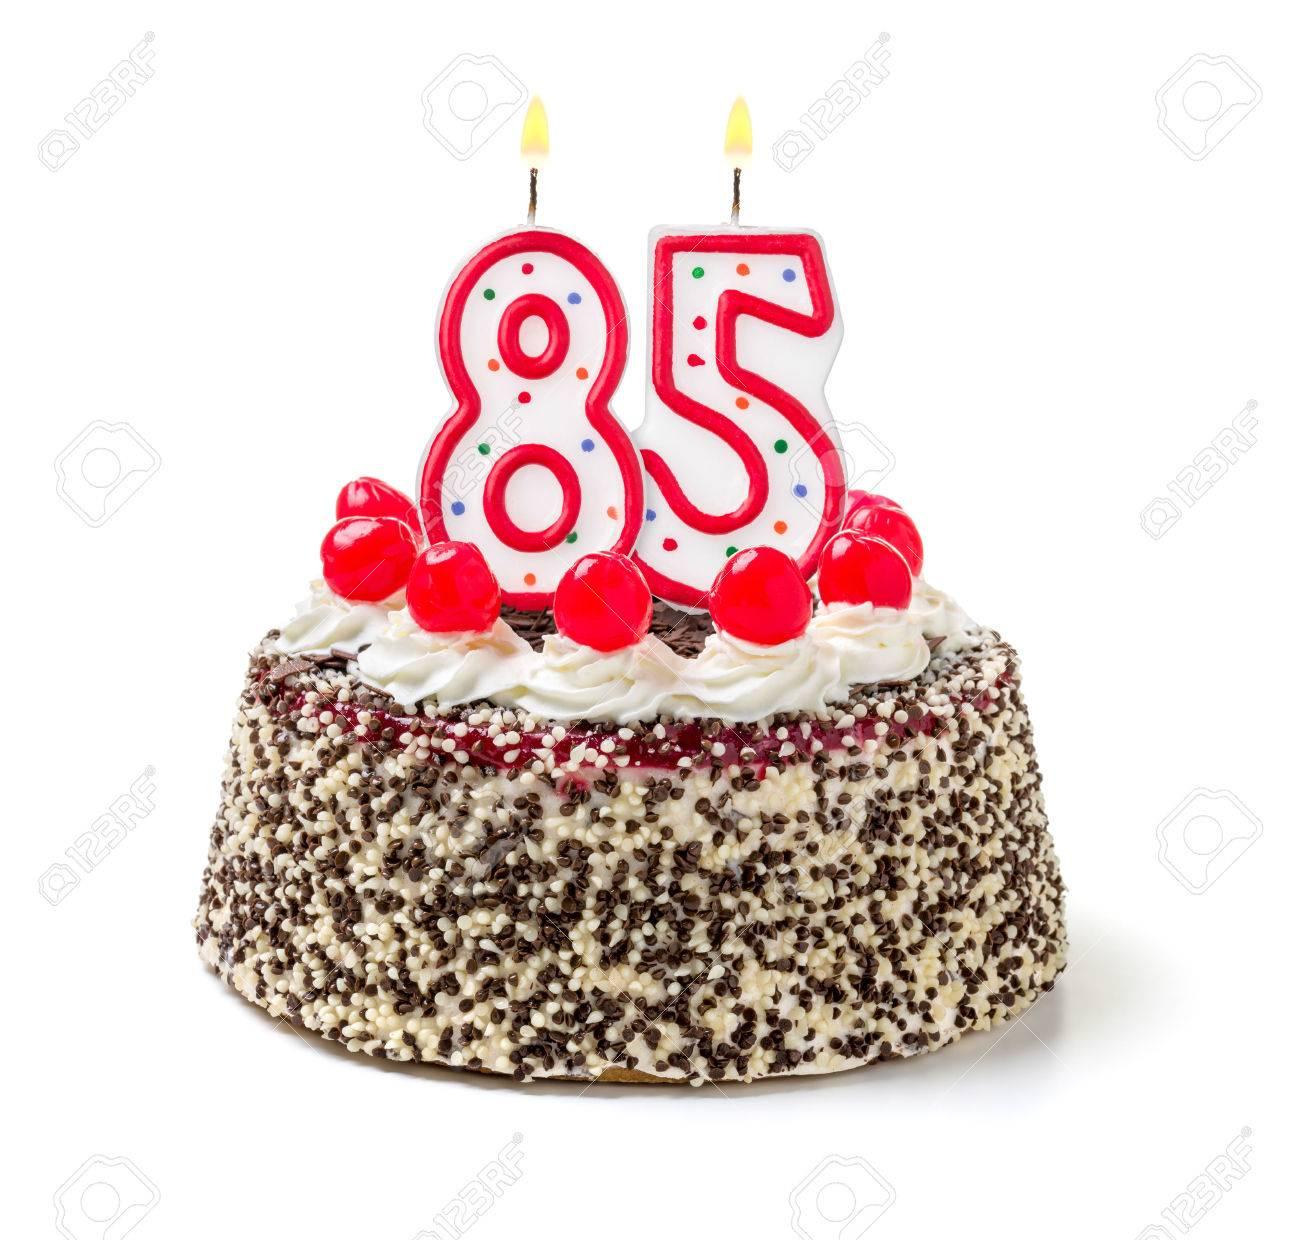 Birthday Cake With Burning Candle Number 85 Stock Photo